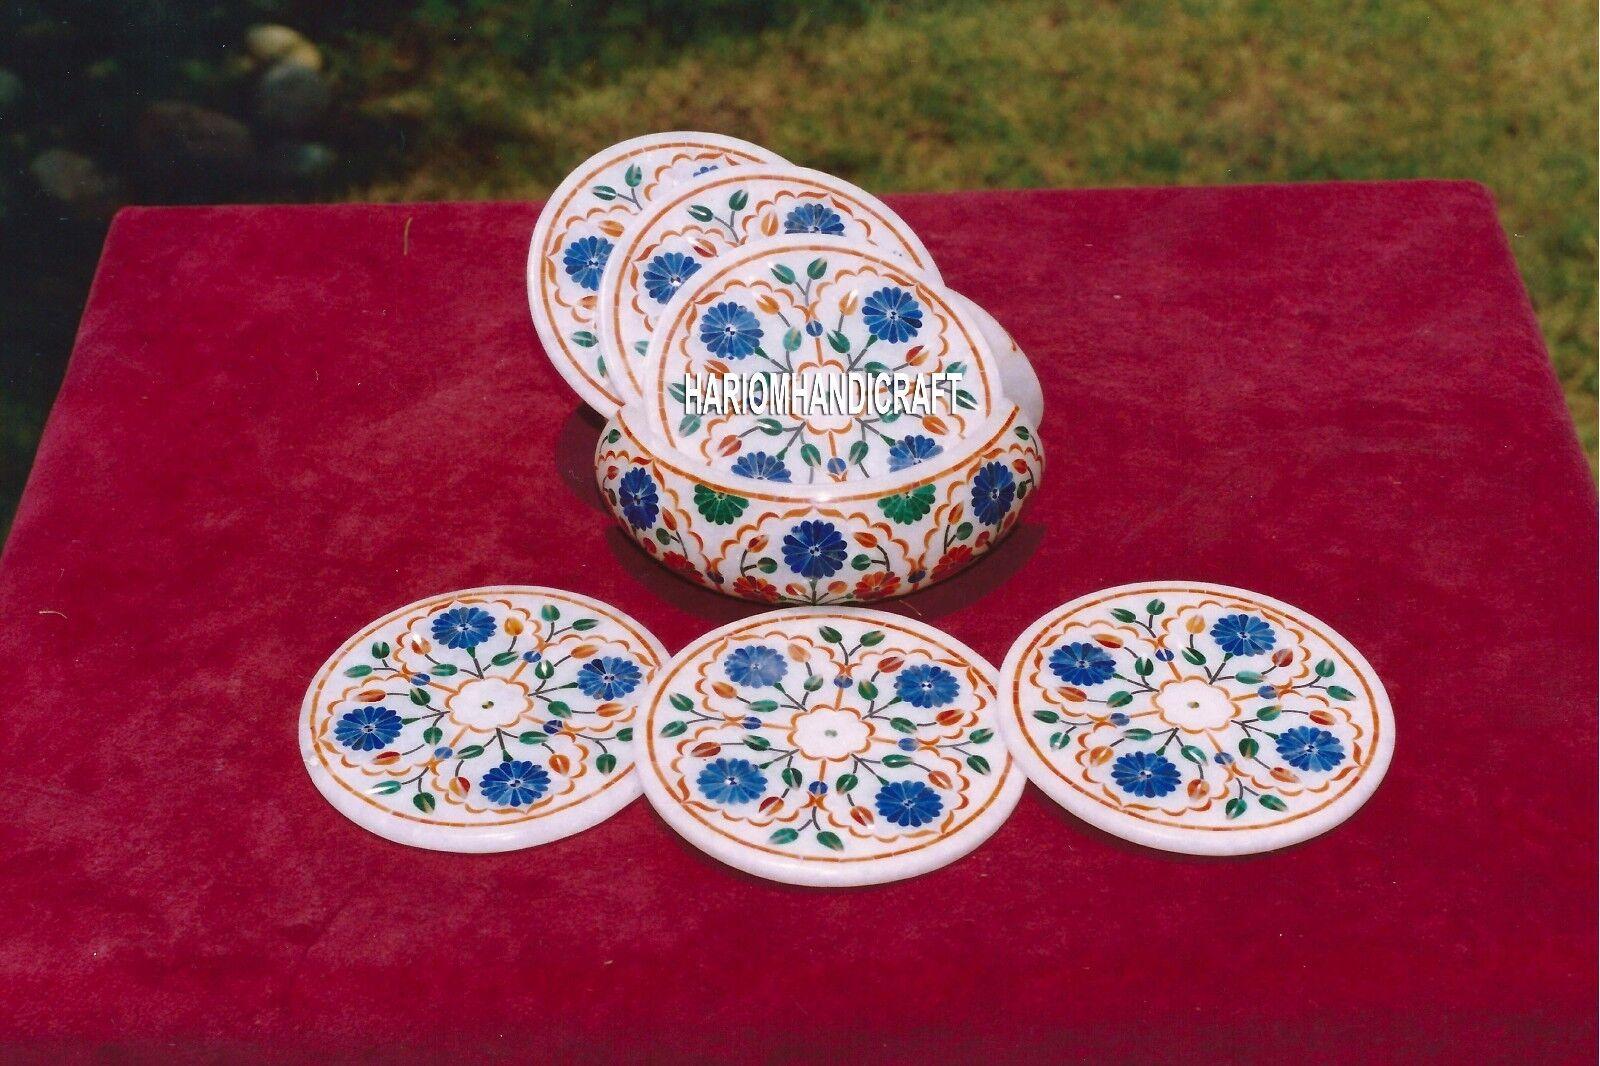 Exclusive Inlay Marble Coaster Set pietradure Inlay avec cuisine art decor H4064